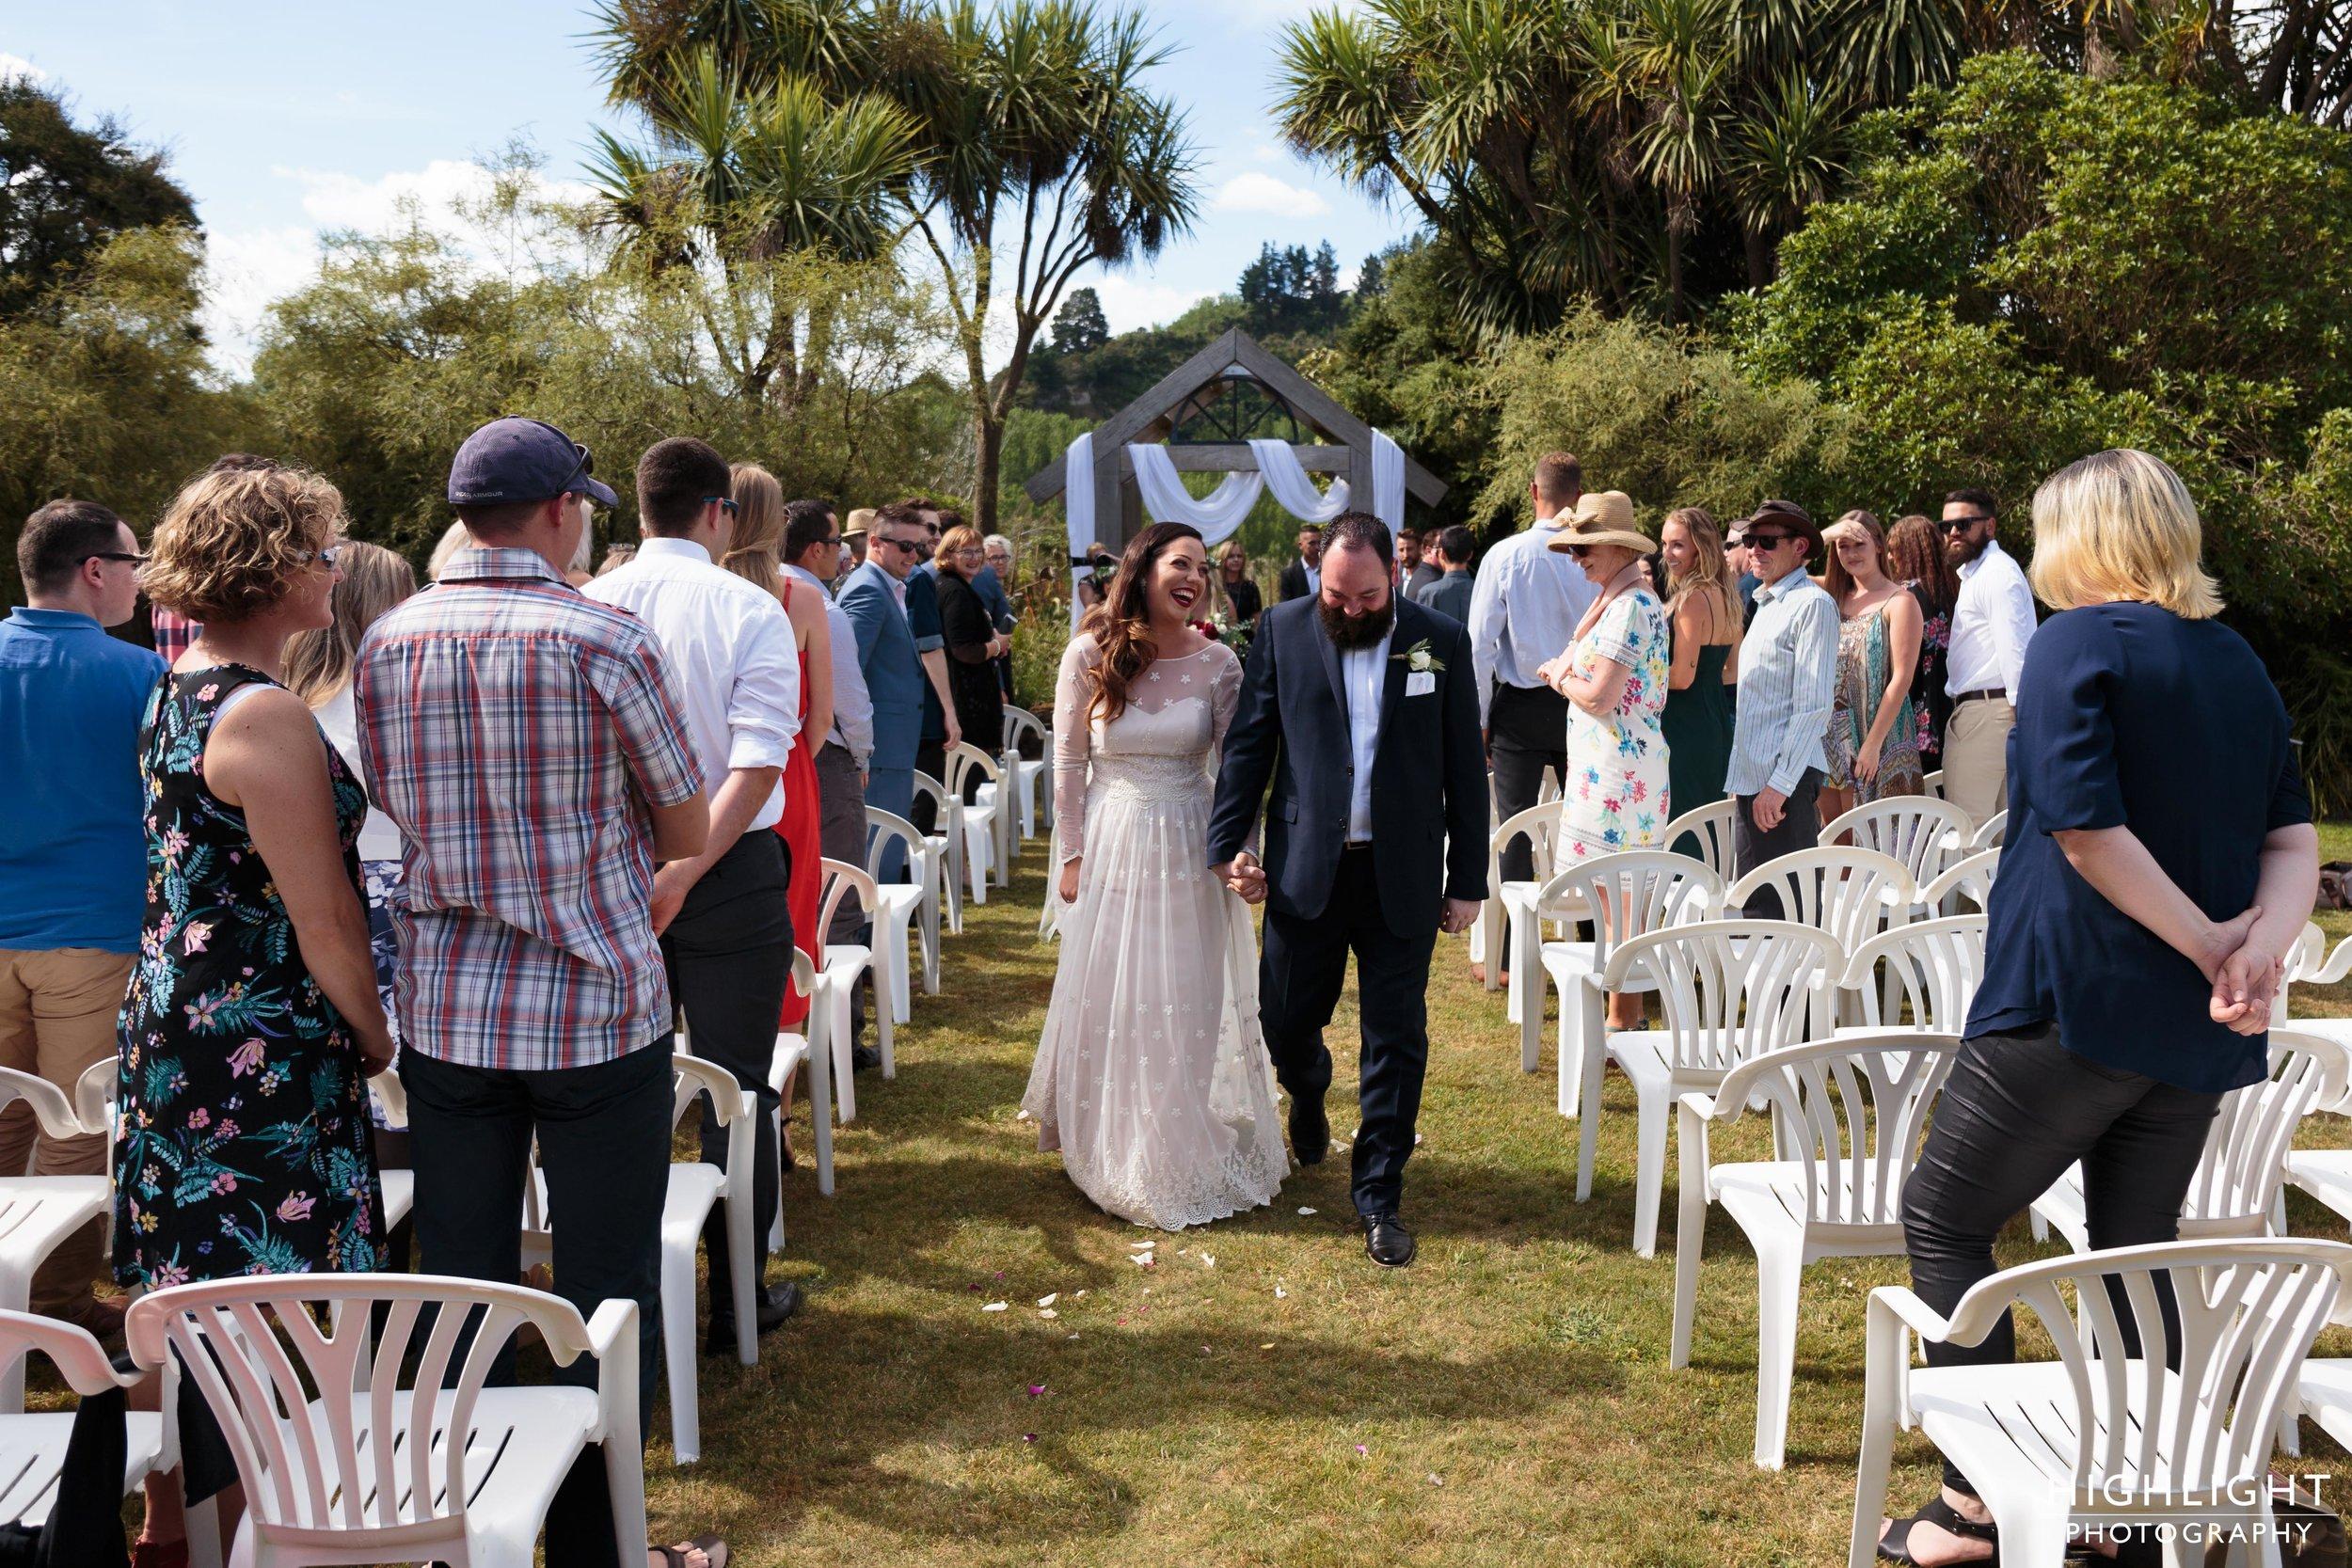 highlight-wedding-photography-new-zealand-makoura-lodge-wedding-88.jpg